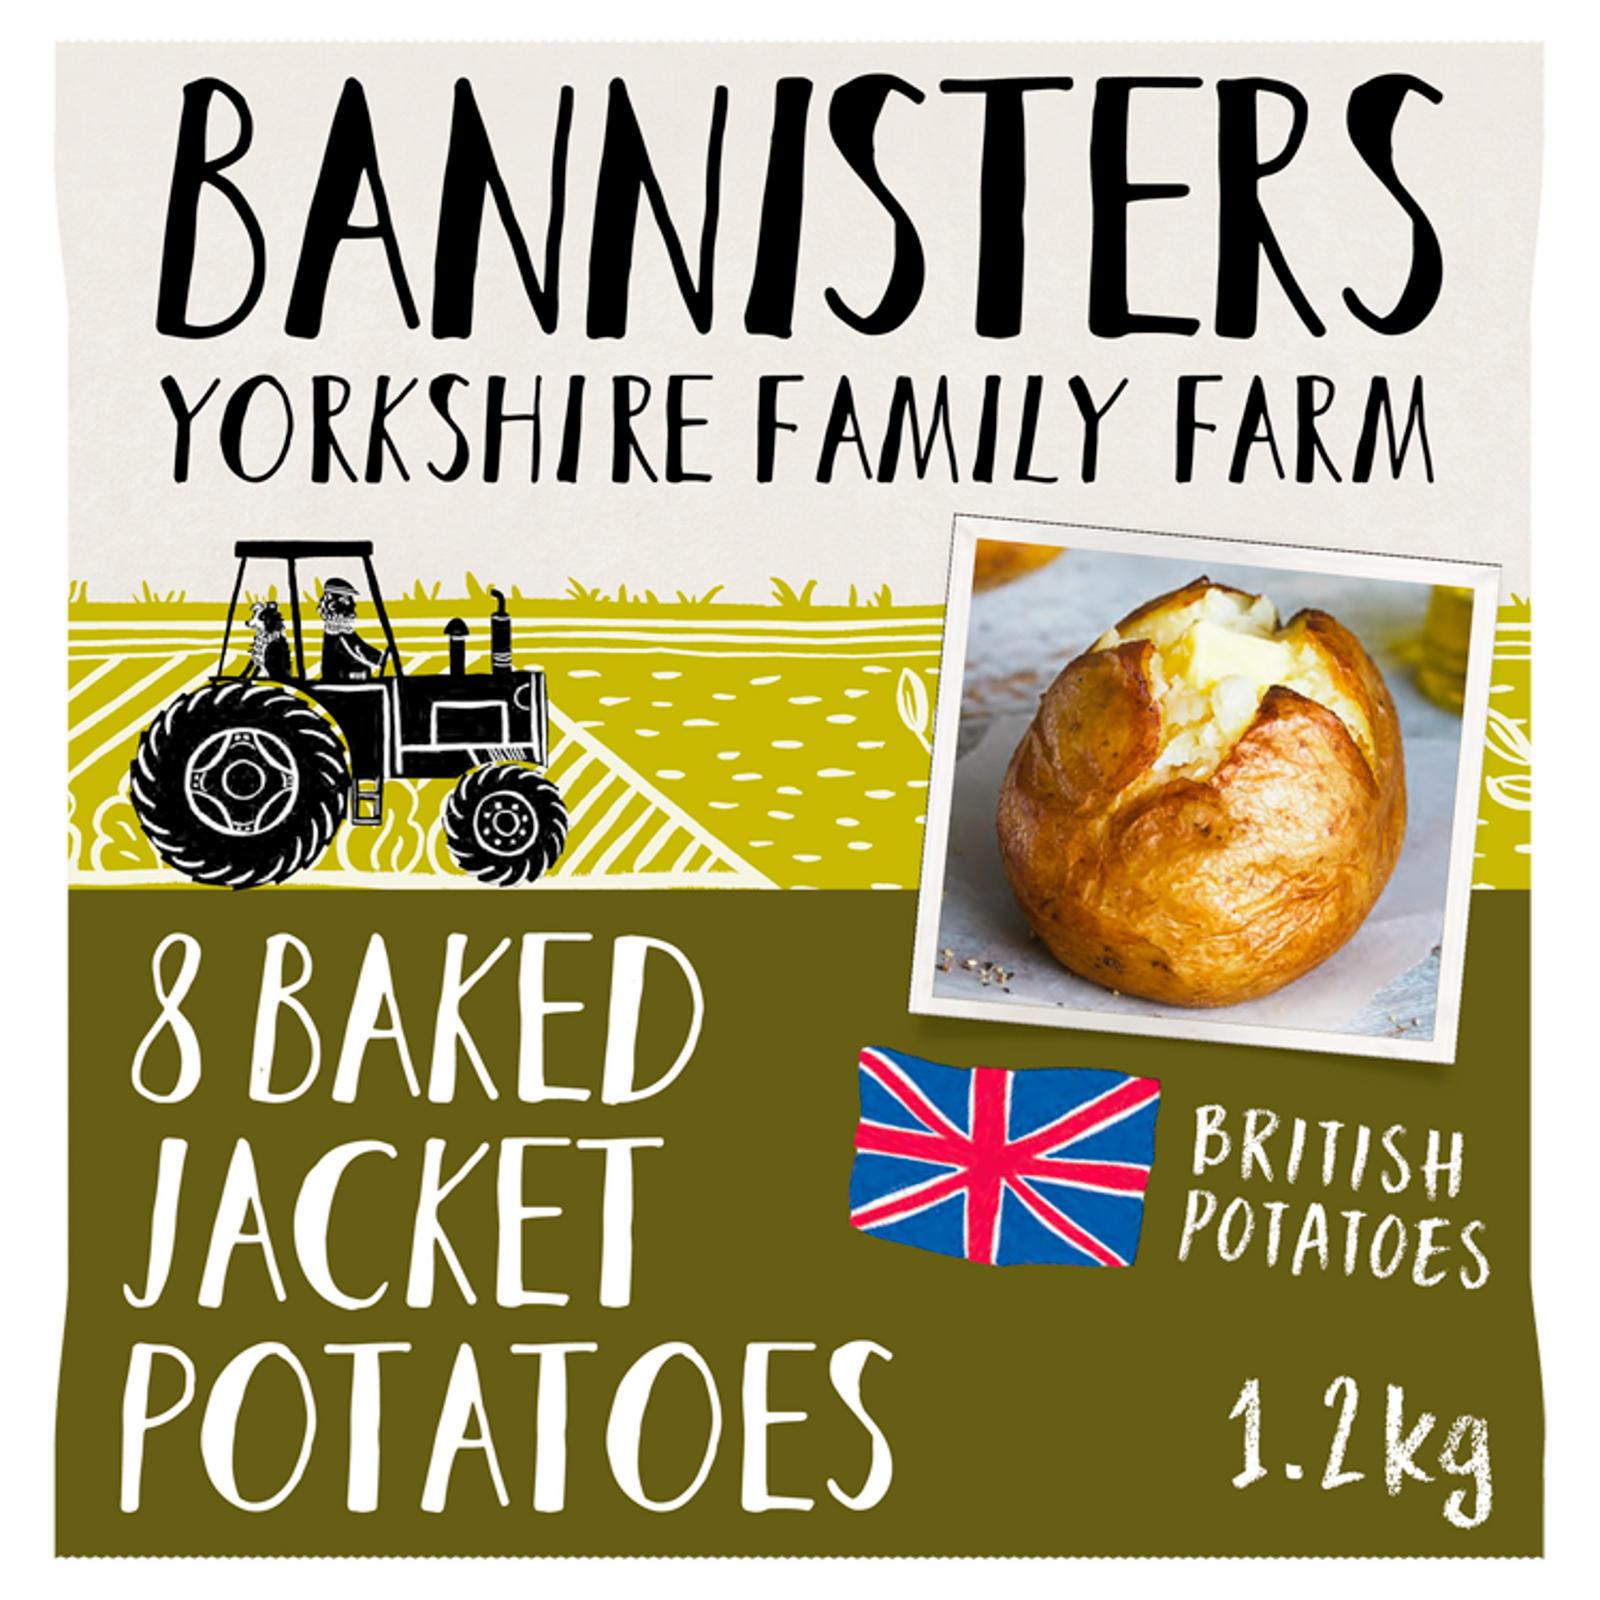 Bannisters Yorkshire Family Farm 8 Baked Jacket Potatoes 12